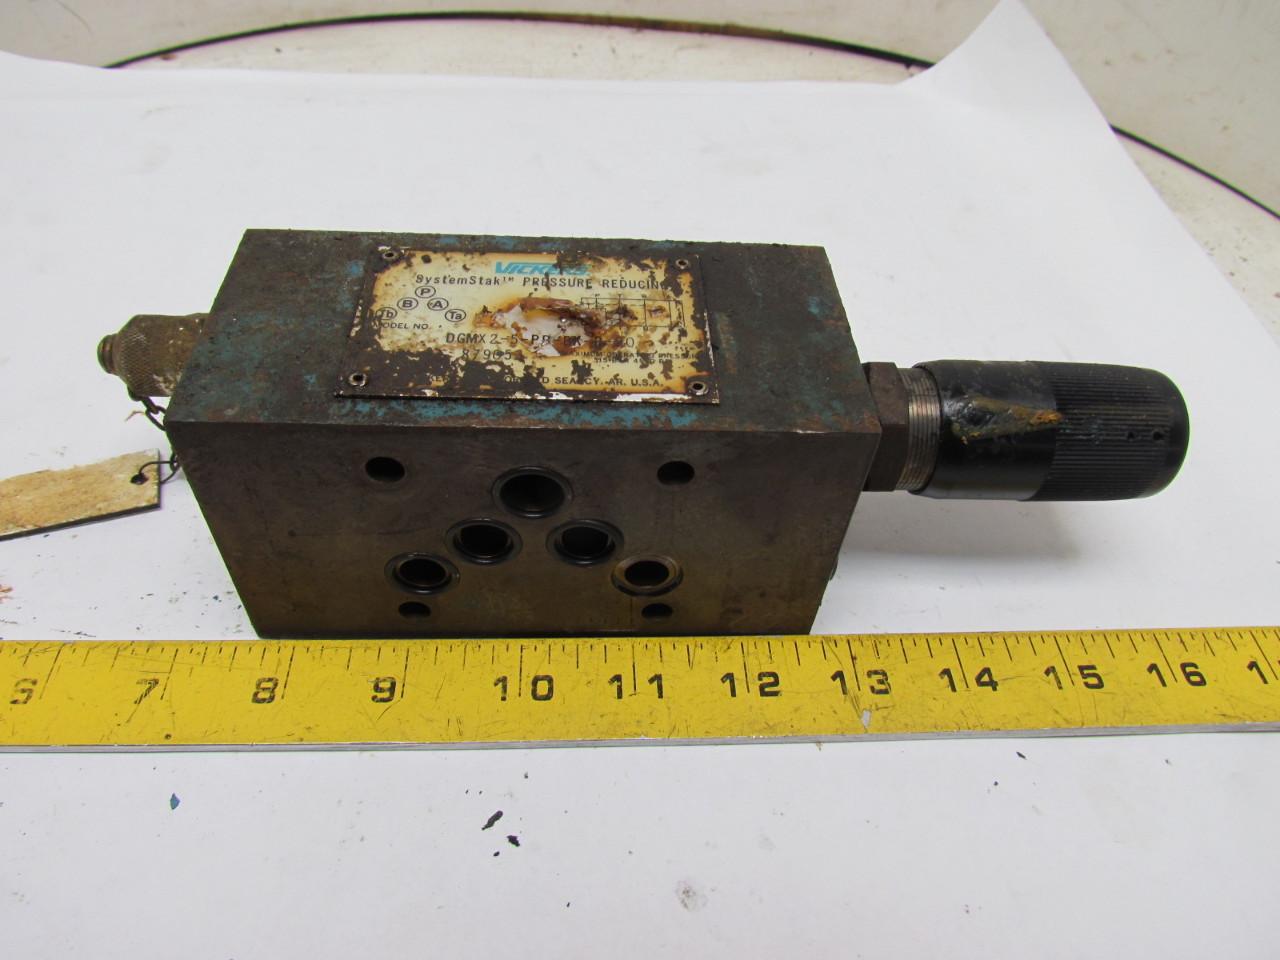 Vickers DGMX2-5-PB-BK-B-30 Hydraulic Pressure Reducing Valve Keyed